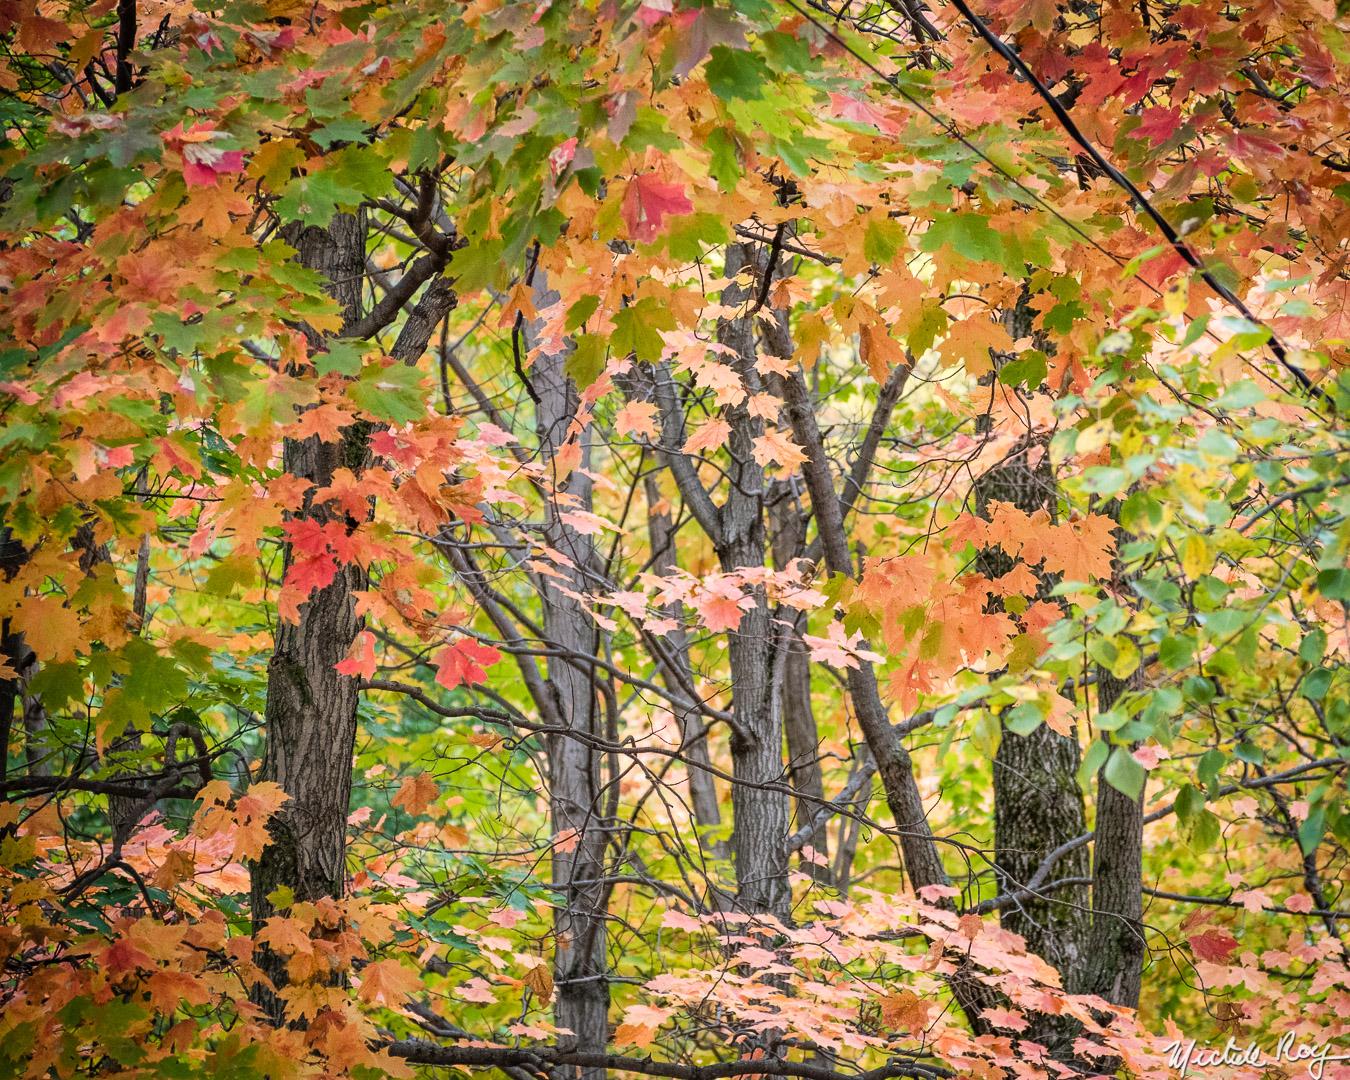 Couleurs automnales (4) / Fall colors (4)